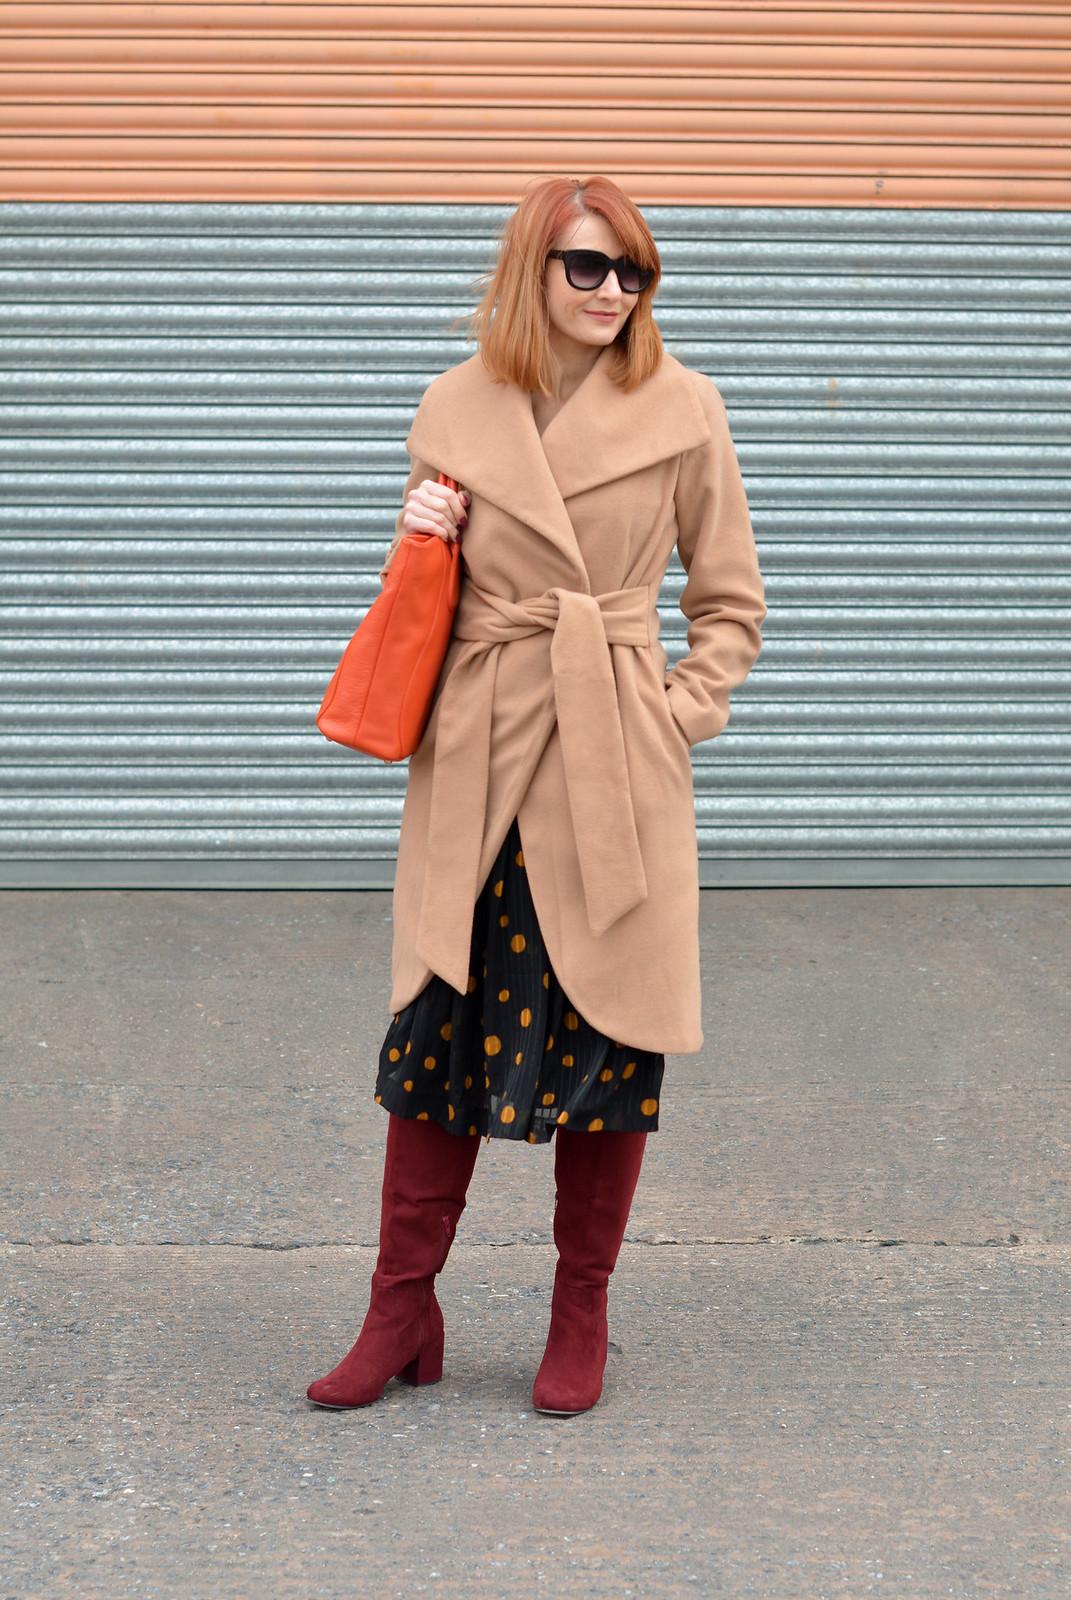 Camel wrap coat, vintage 70s polka dots dress, burgundy boots, orange tote | Not Dressed As Lamb